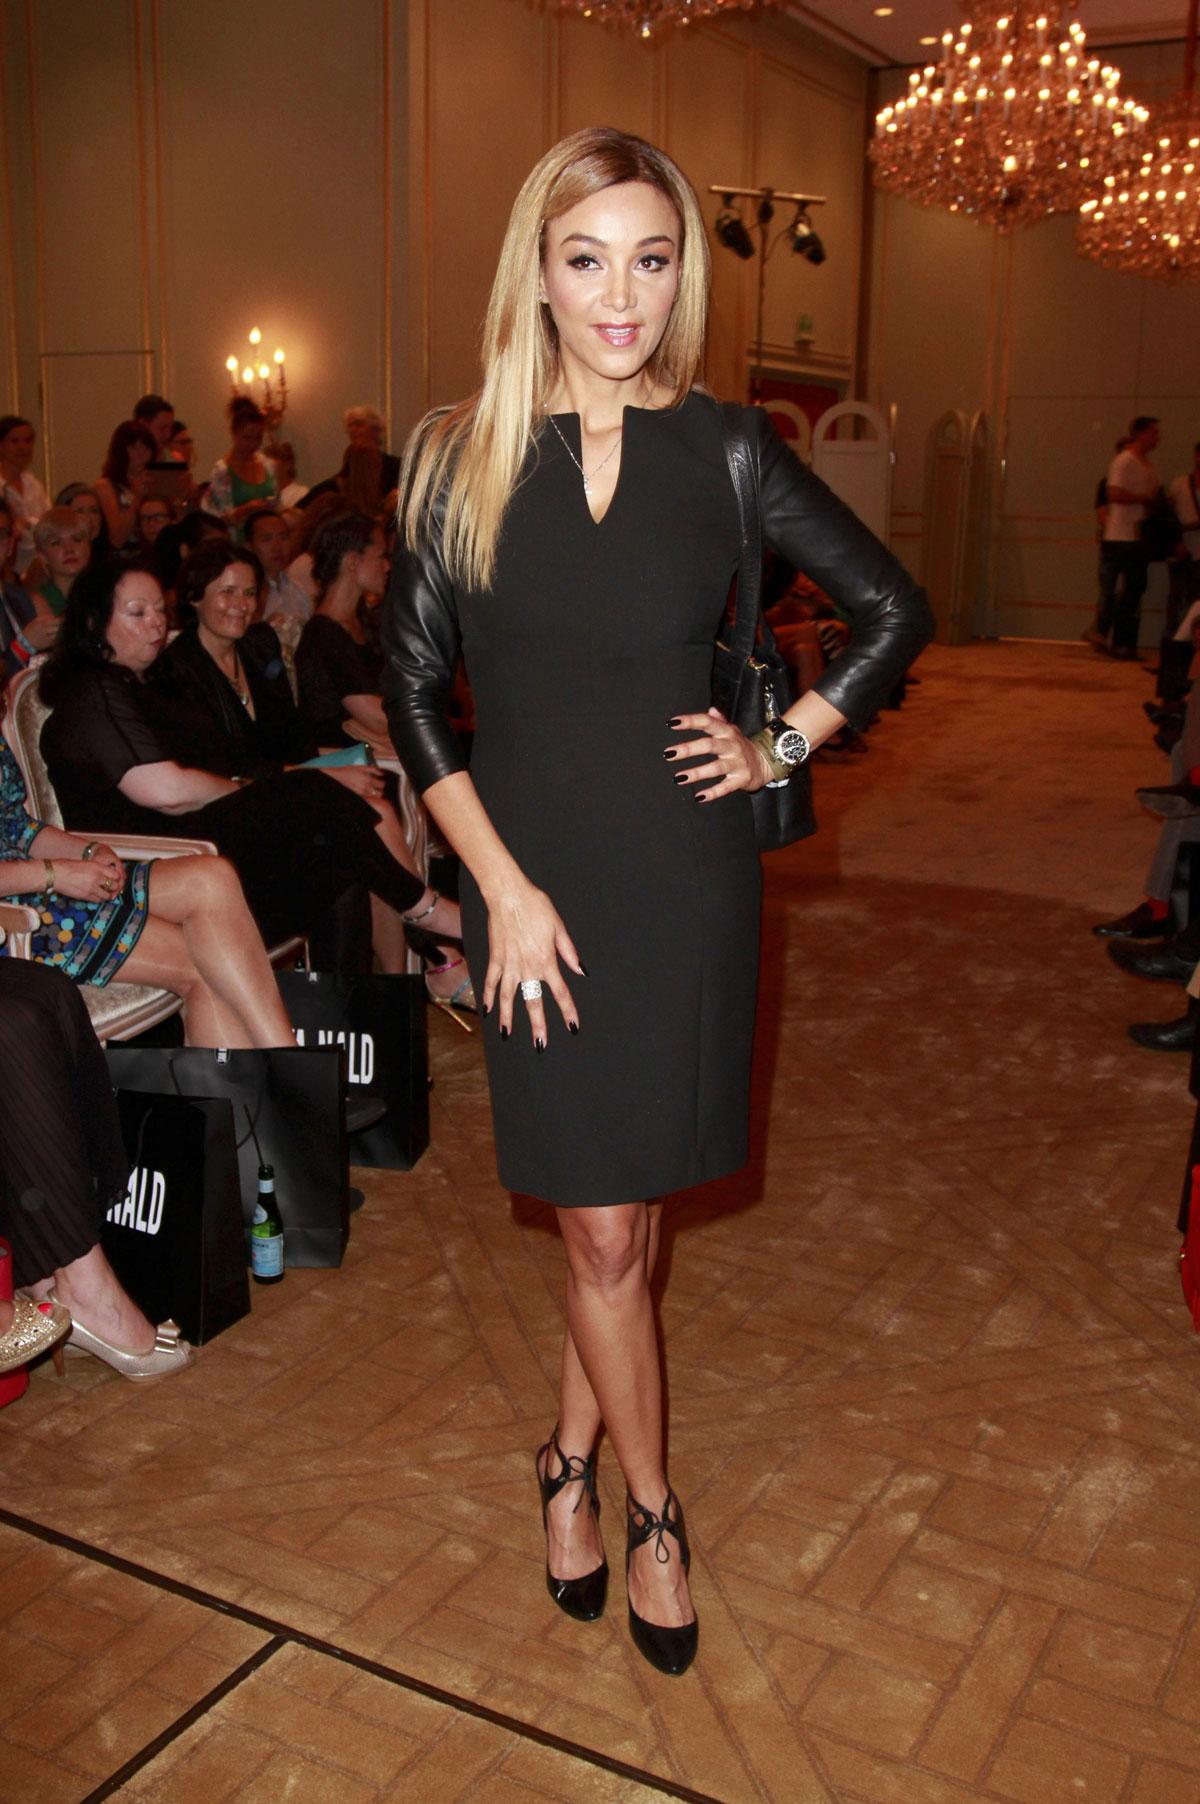 Verona Pooth attends Mercedes-Benz Fashion Week